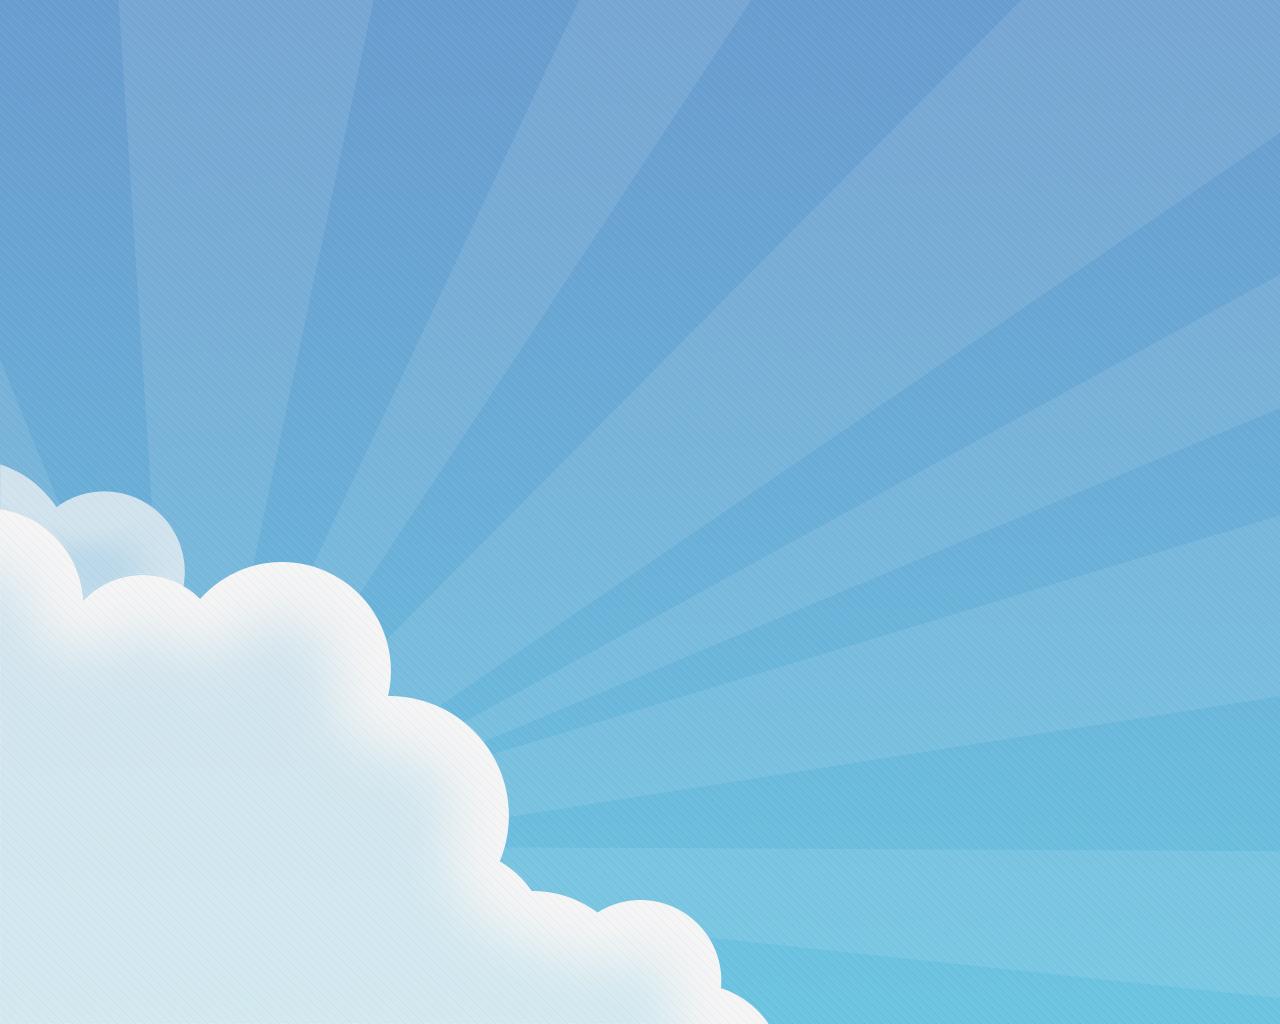 14 Cloud Vector Clip Art Free Images